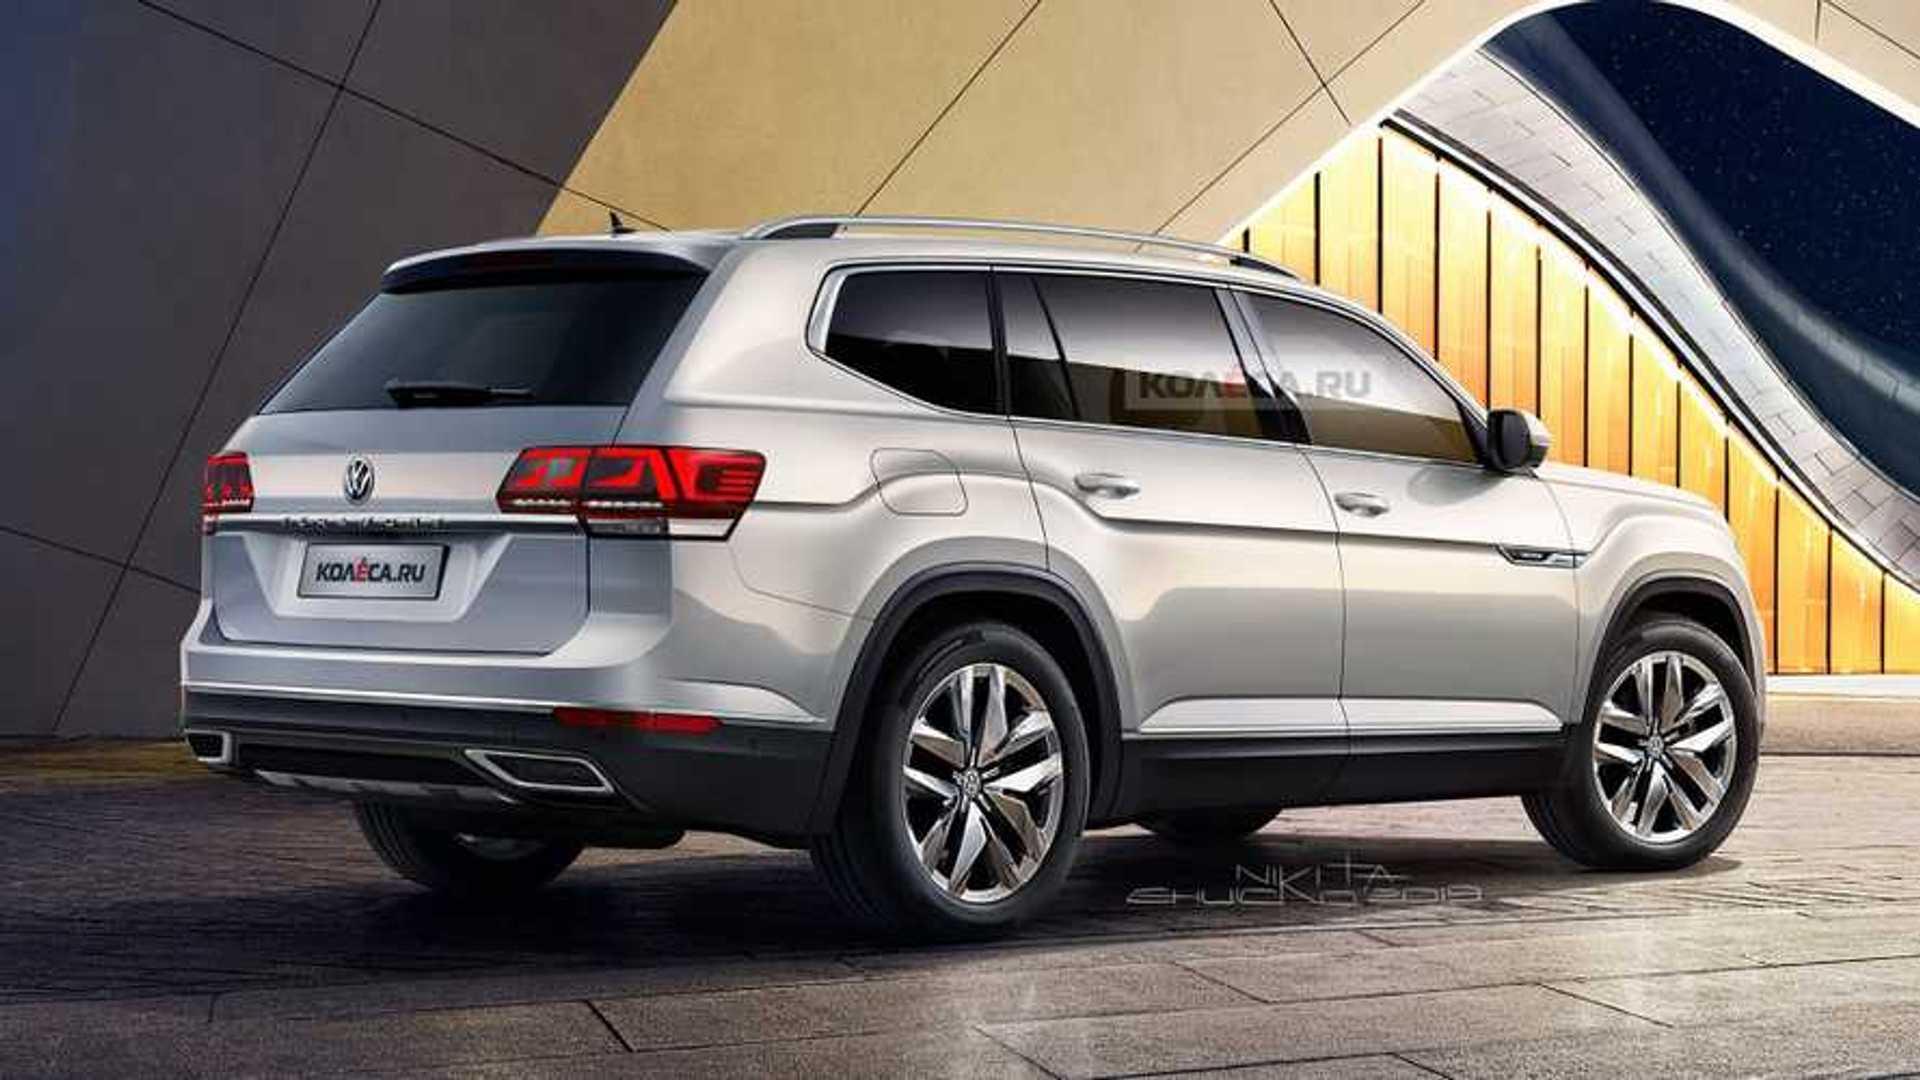 2021 VW Atlas Imagined With Subtle Facelift